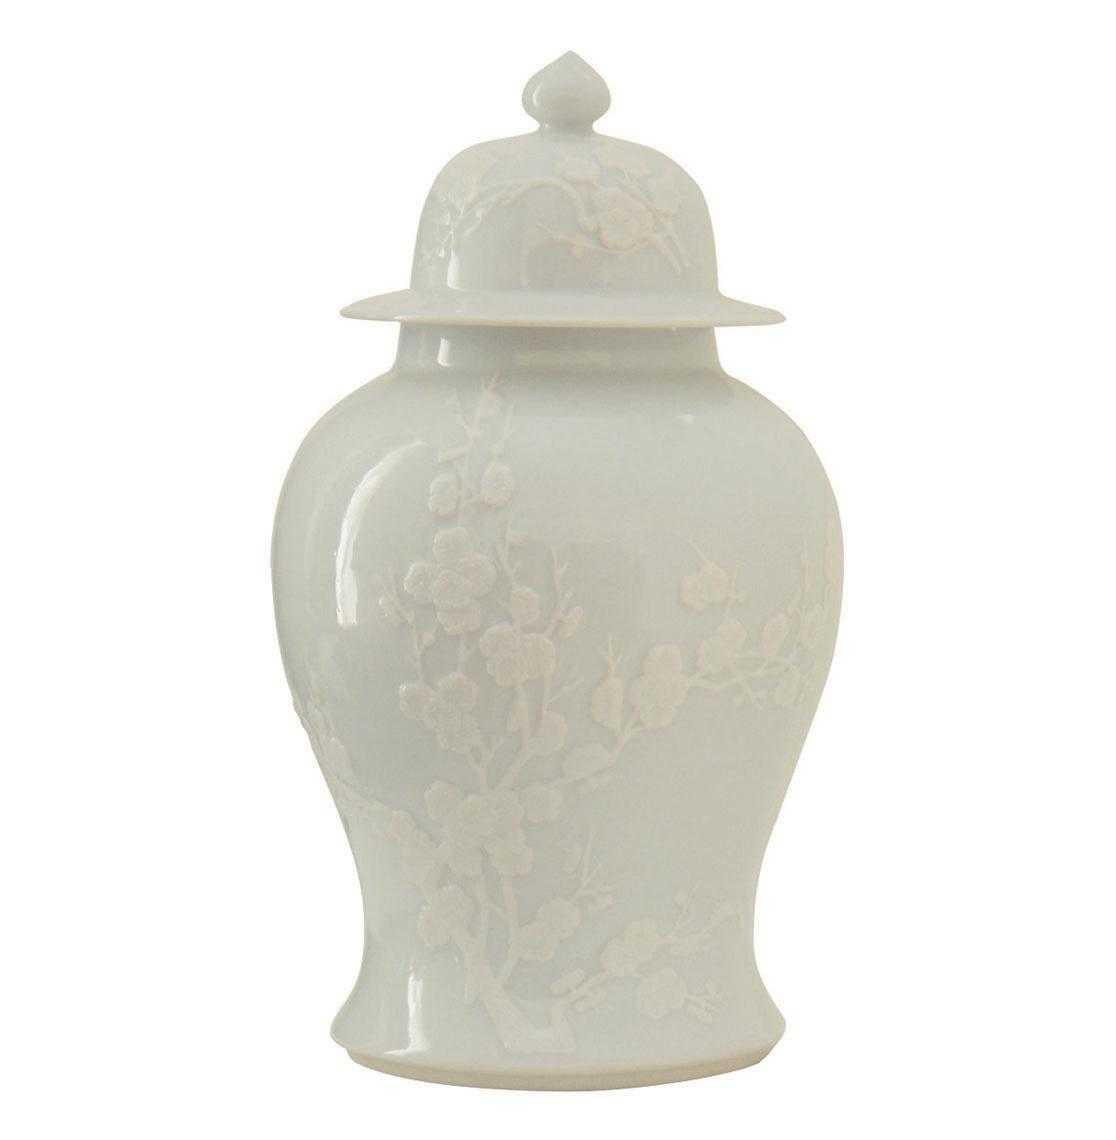 Blanc De Chine White Porcelain Cherry Blossom Ginger Temple Jar